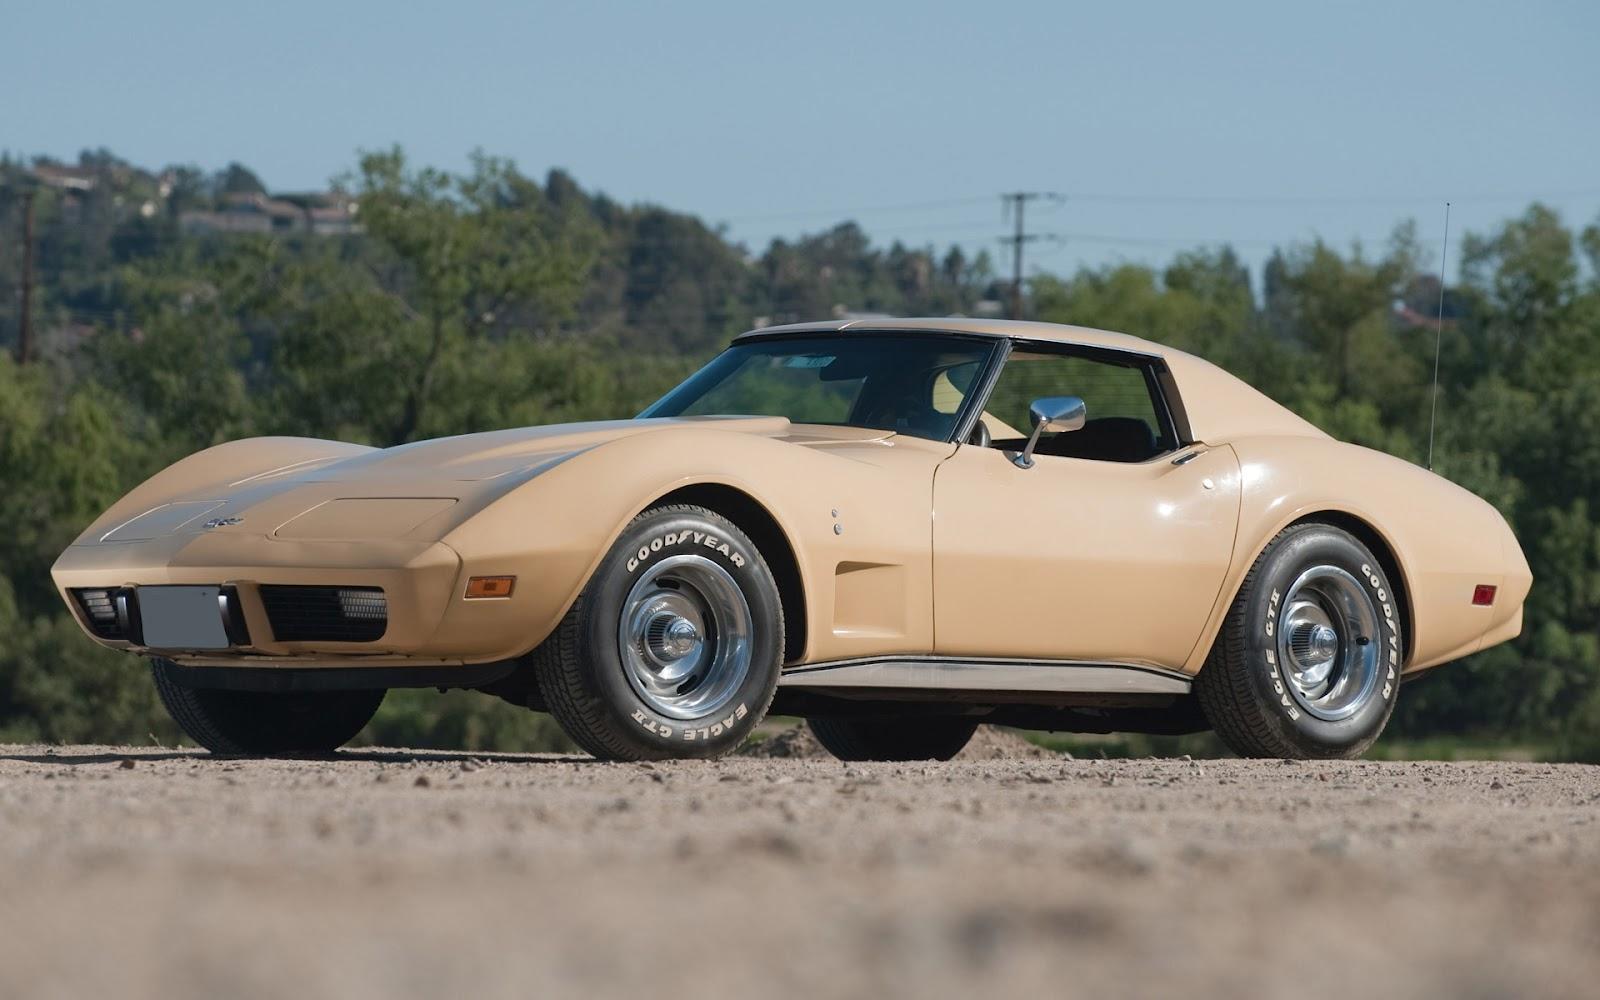 http://4.bp.blogspot.com/-SvAPhPJSziw/T8N_tz-0FMI/AAAAAAAAwqI/E4Ft-j3vuV0/s1600/Corvette+(C3)+1977.jpg